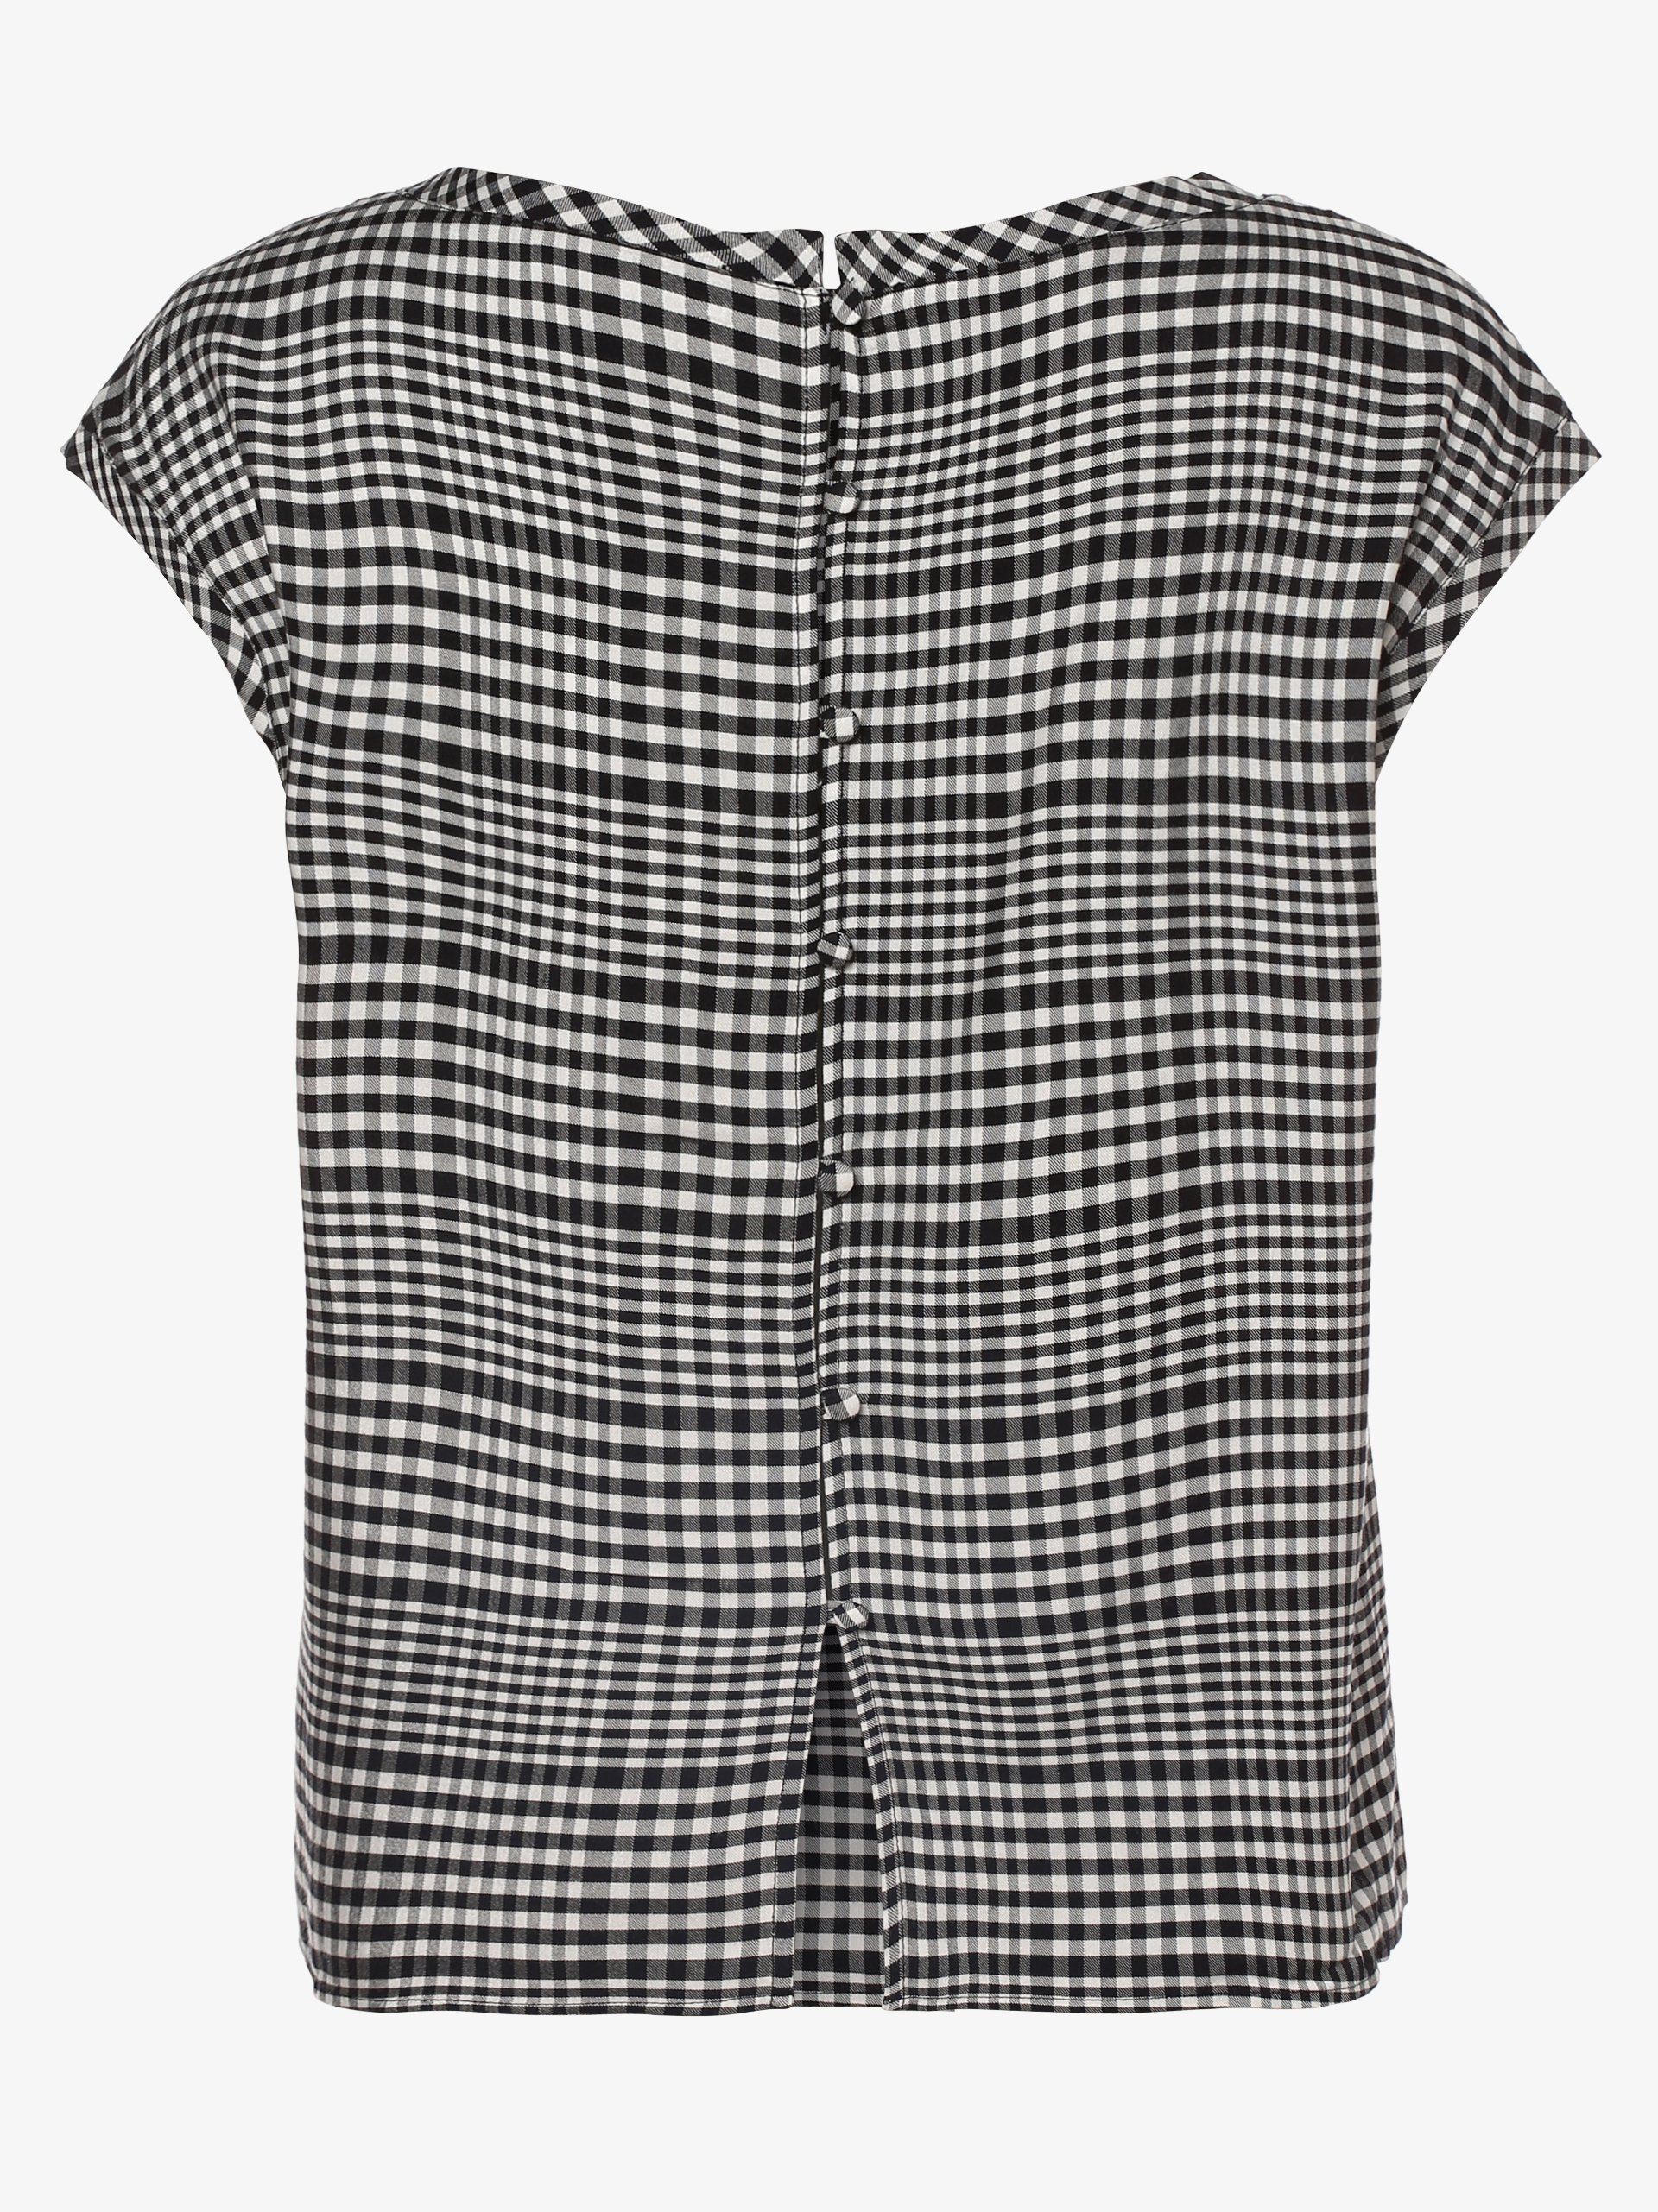 Opus Damska bluzka bez rękawów – Faune Check